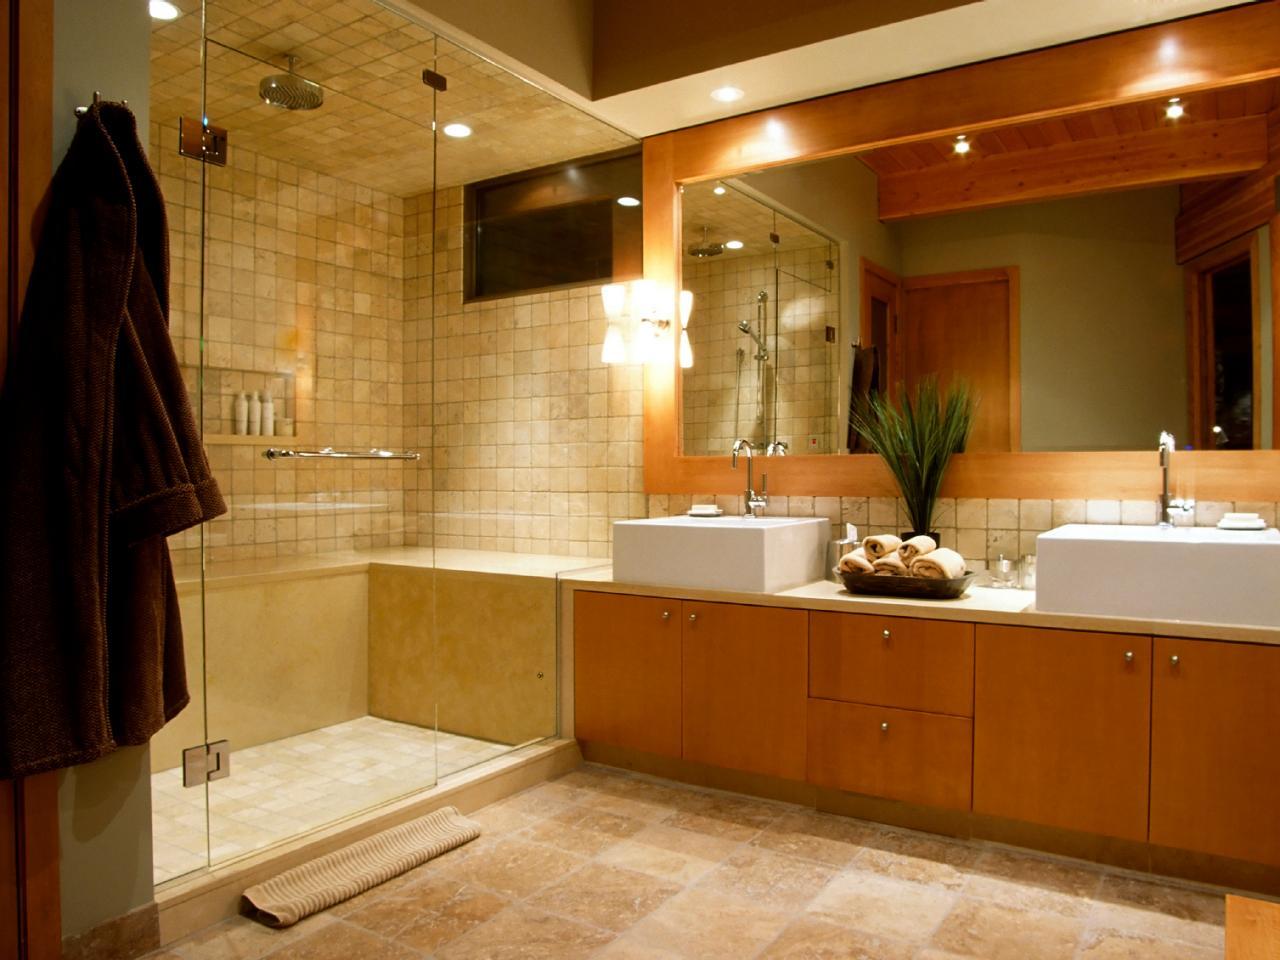 spa bathroom renovations photo - 6